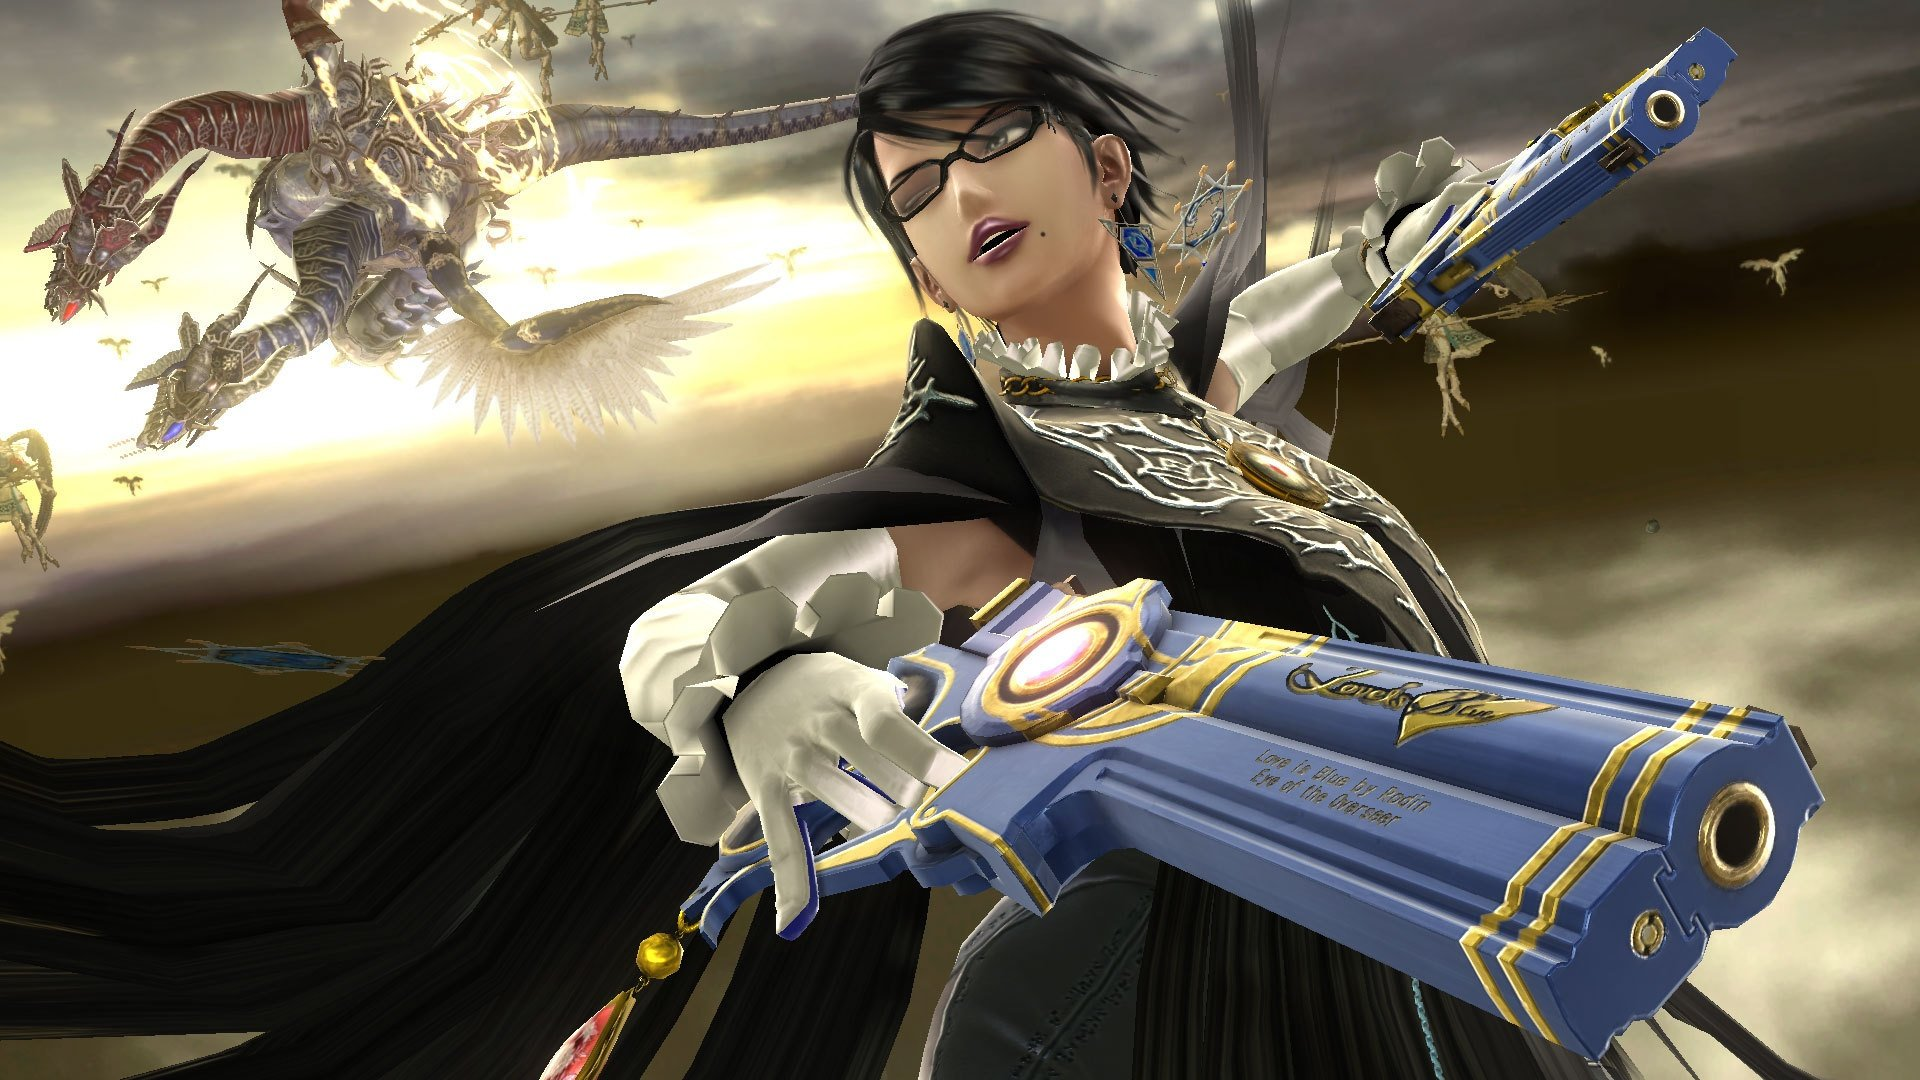 Where was Bayonetta 3 game at E3 2019?